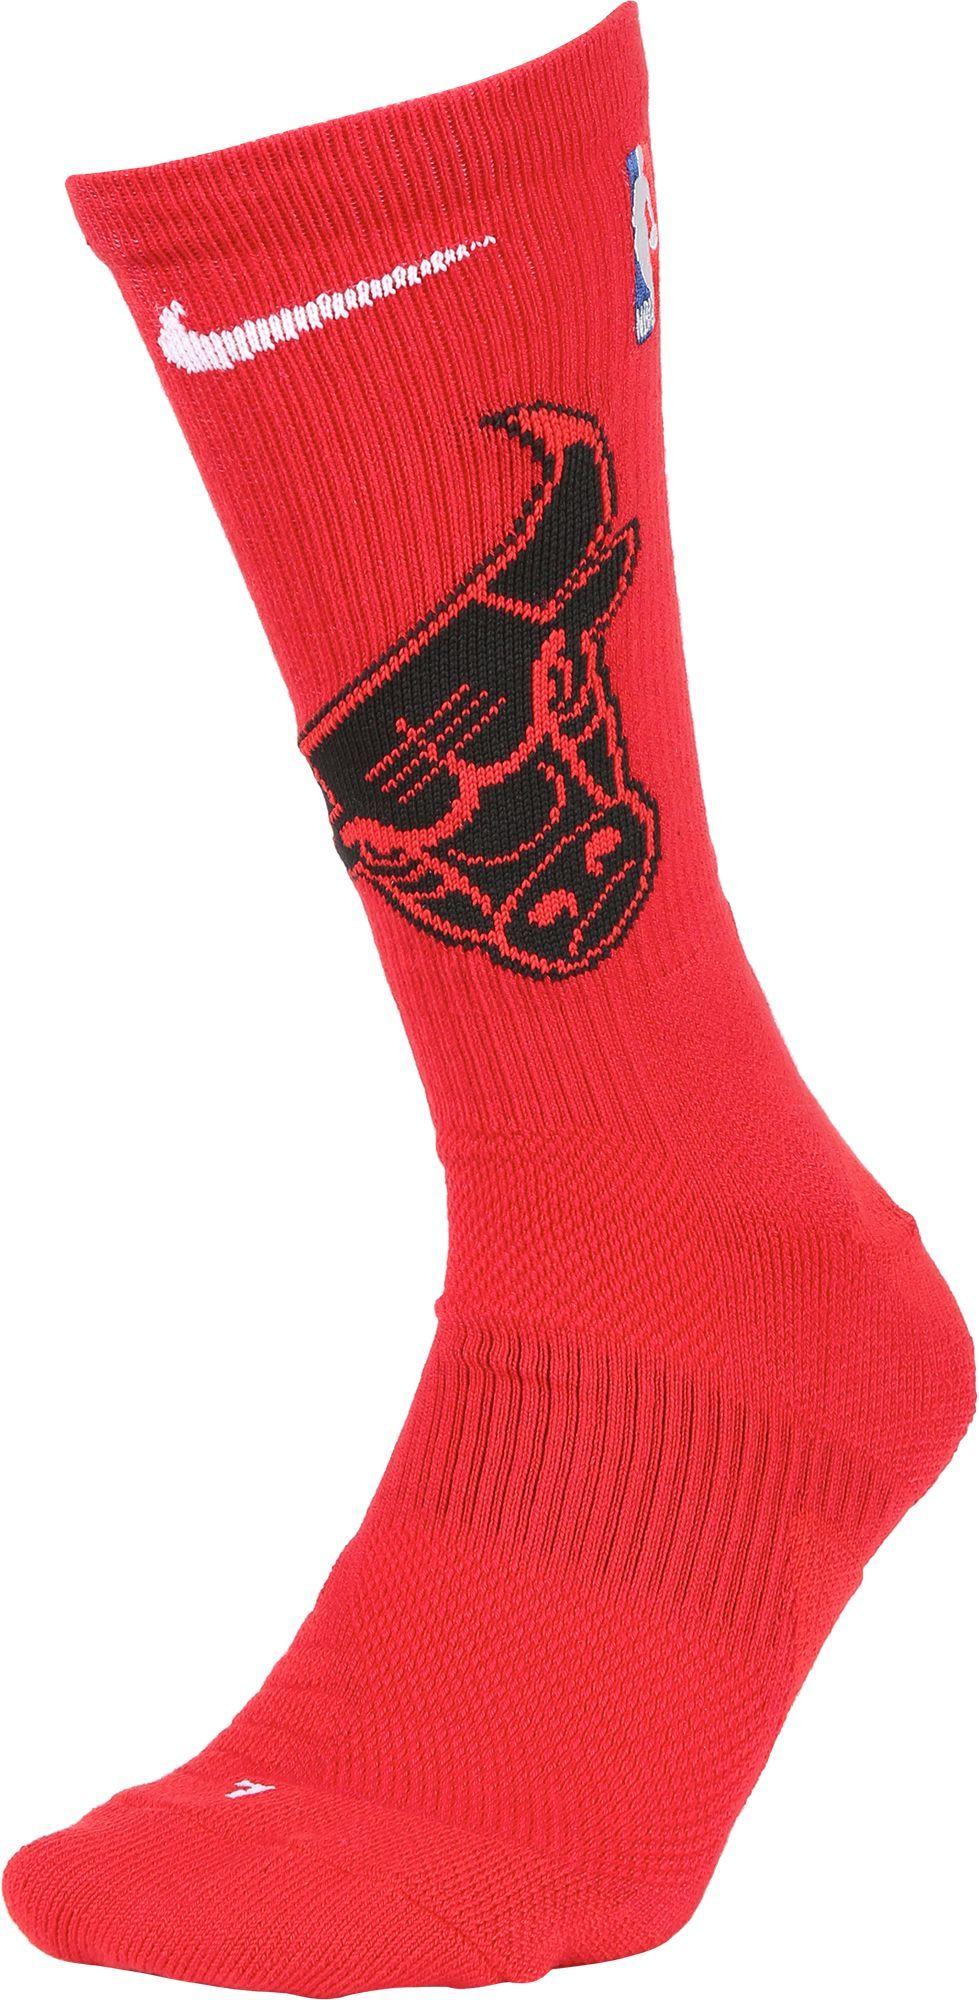 Nike Chicago Bulls Elite Crew Socks, Size: Medium, Team | Products ...